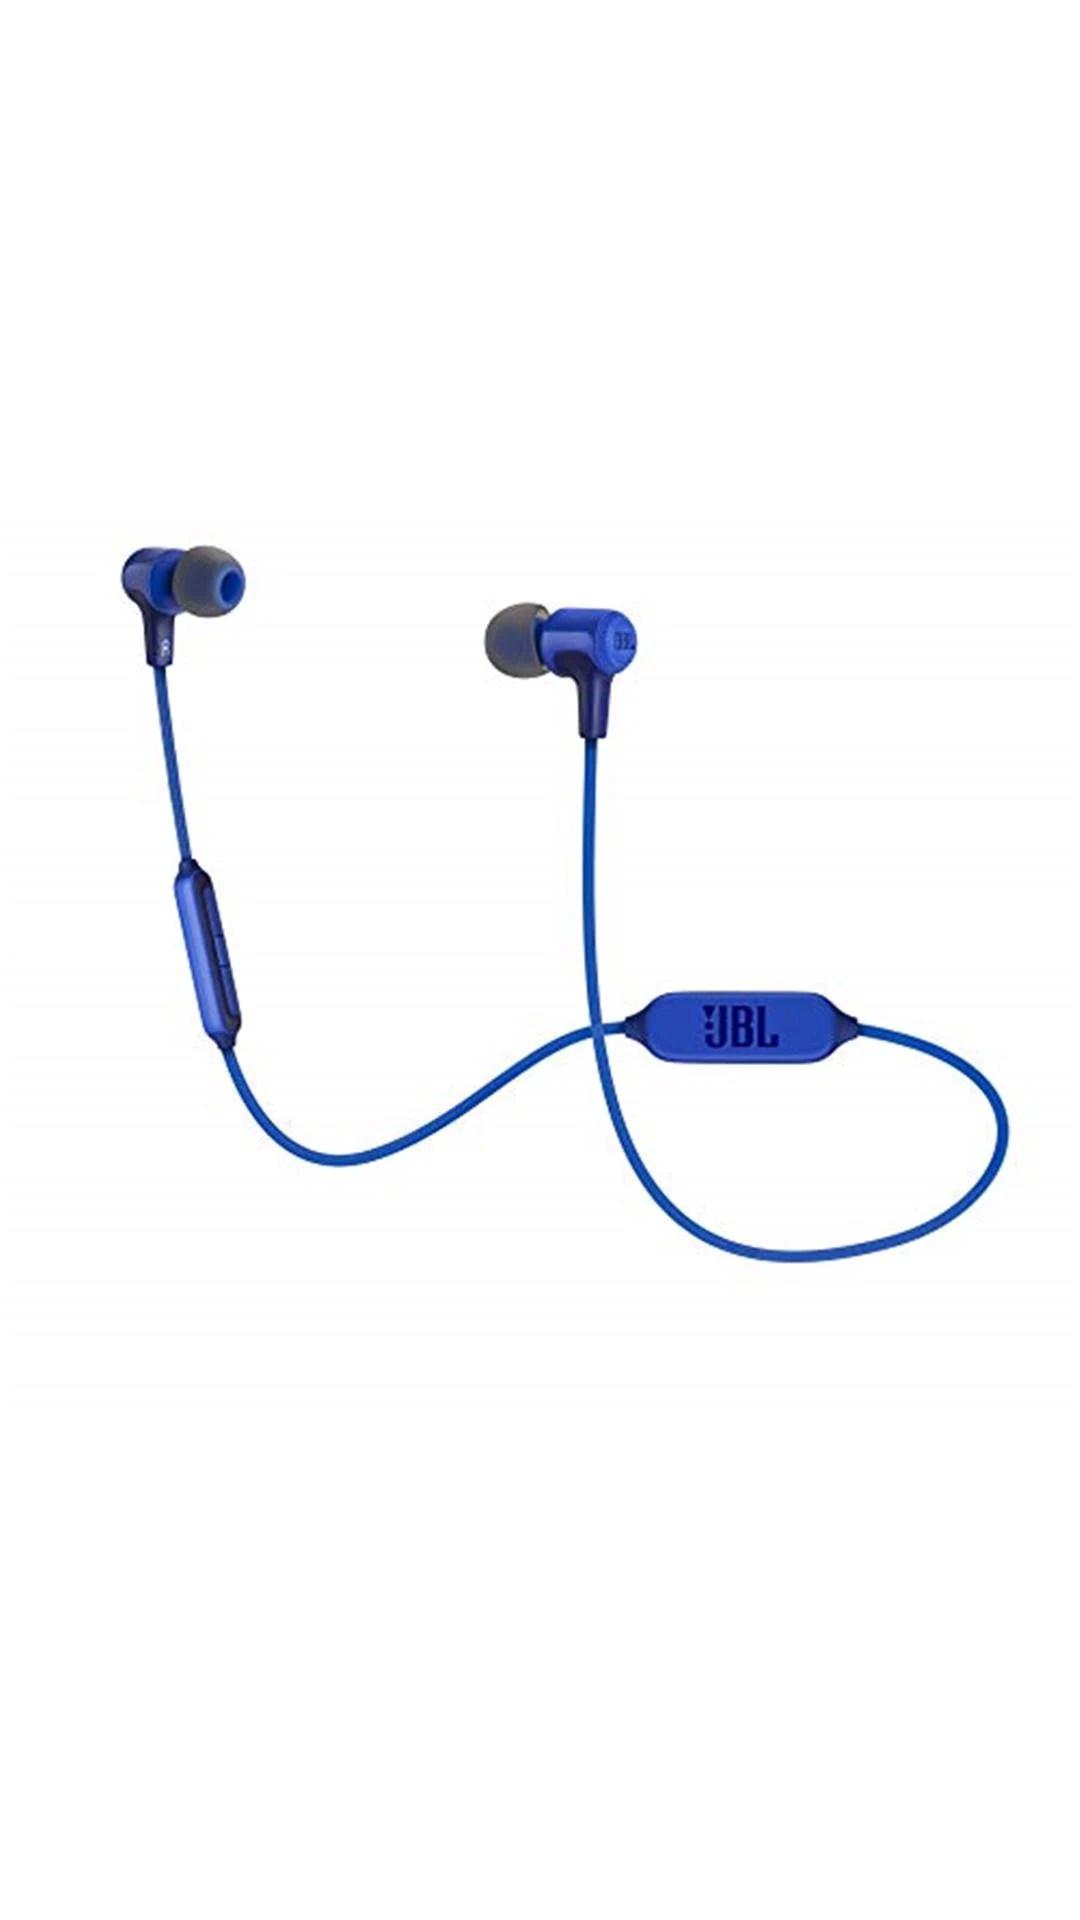 hight resolution of  headphone jack sizes chart jbl headset mic wiring diagram wiring diagram priv on apple headphone wiring diagram